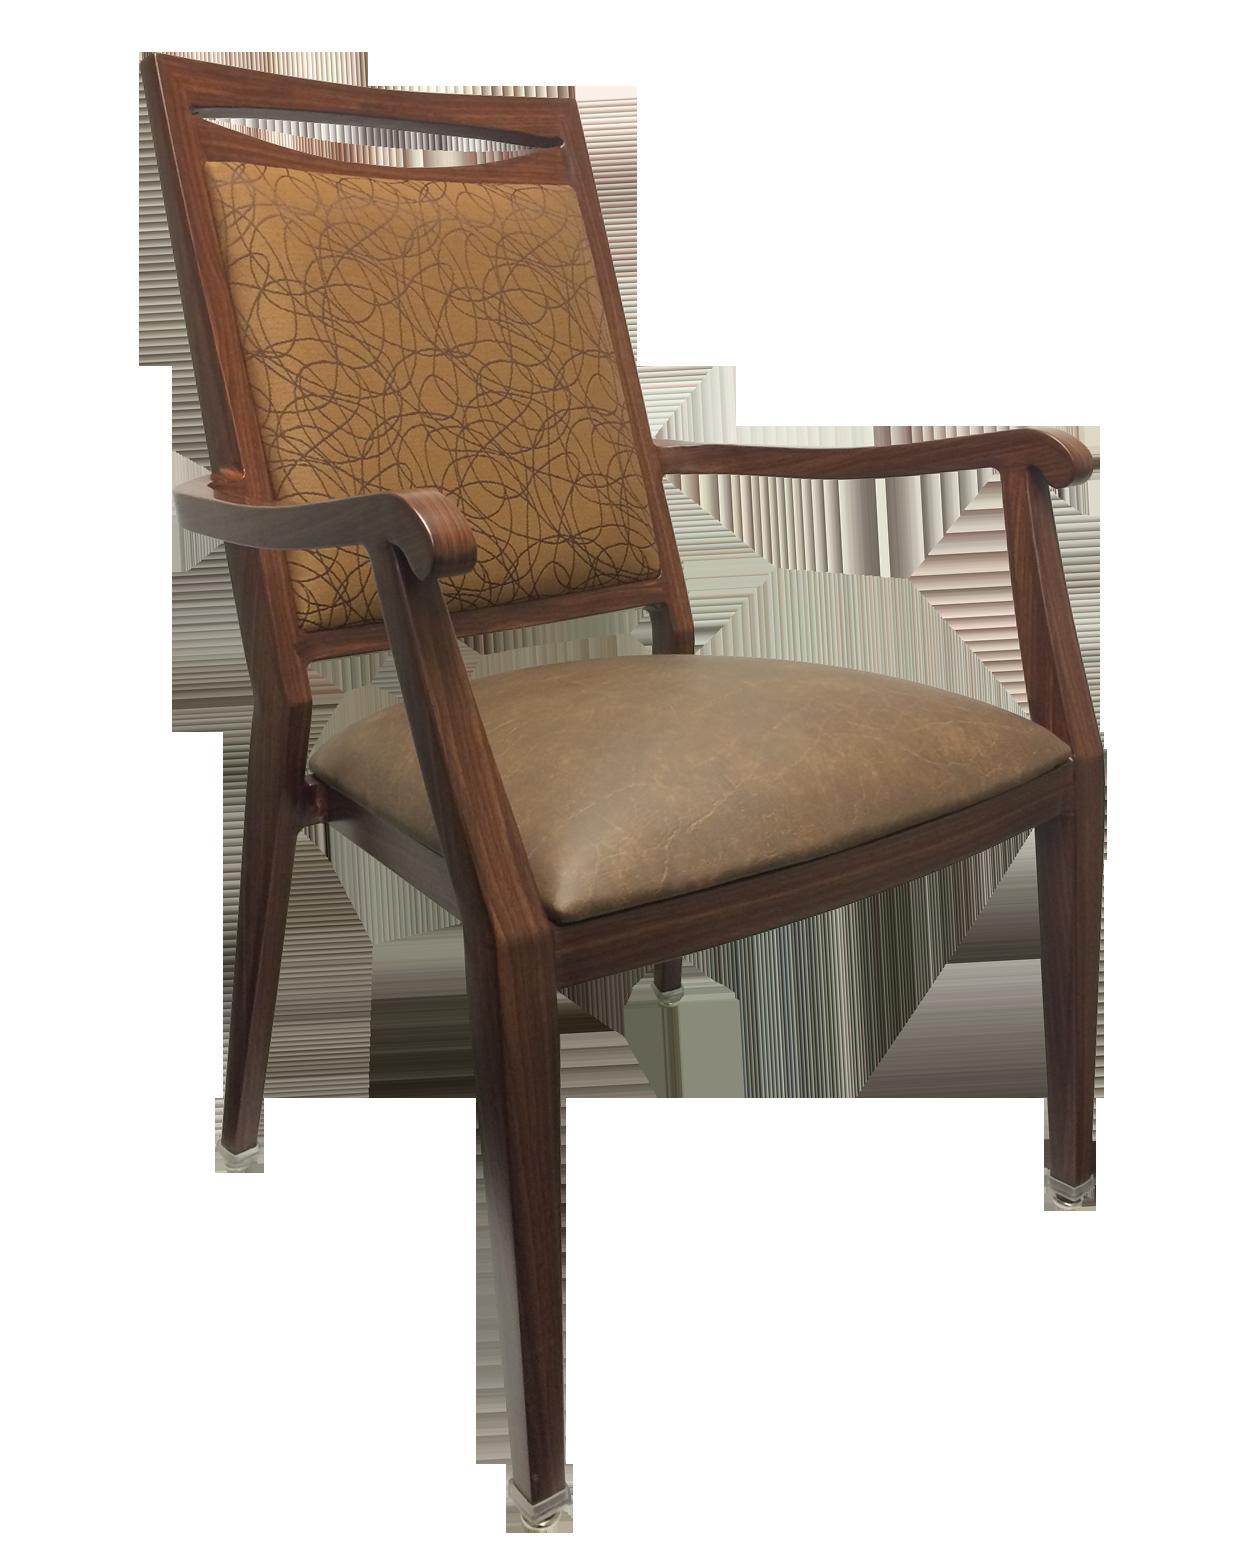 Morgan DuraCare Seating pany